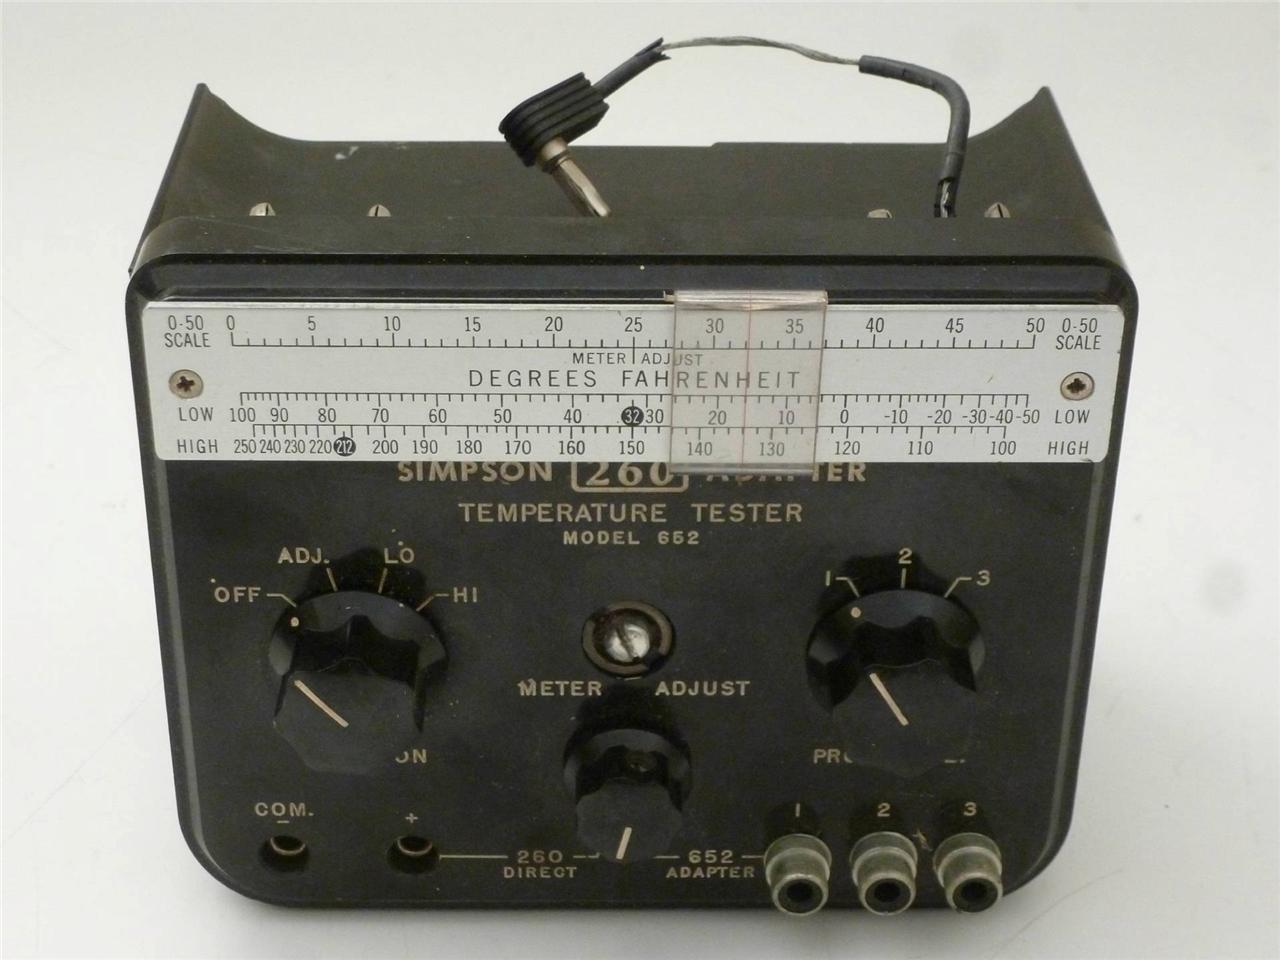 Simpson 260 Multimeter Adapter - Model 652